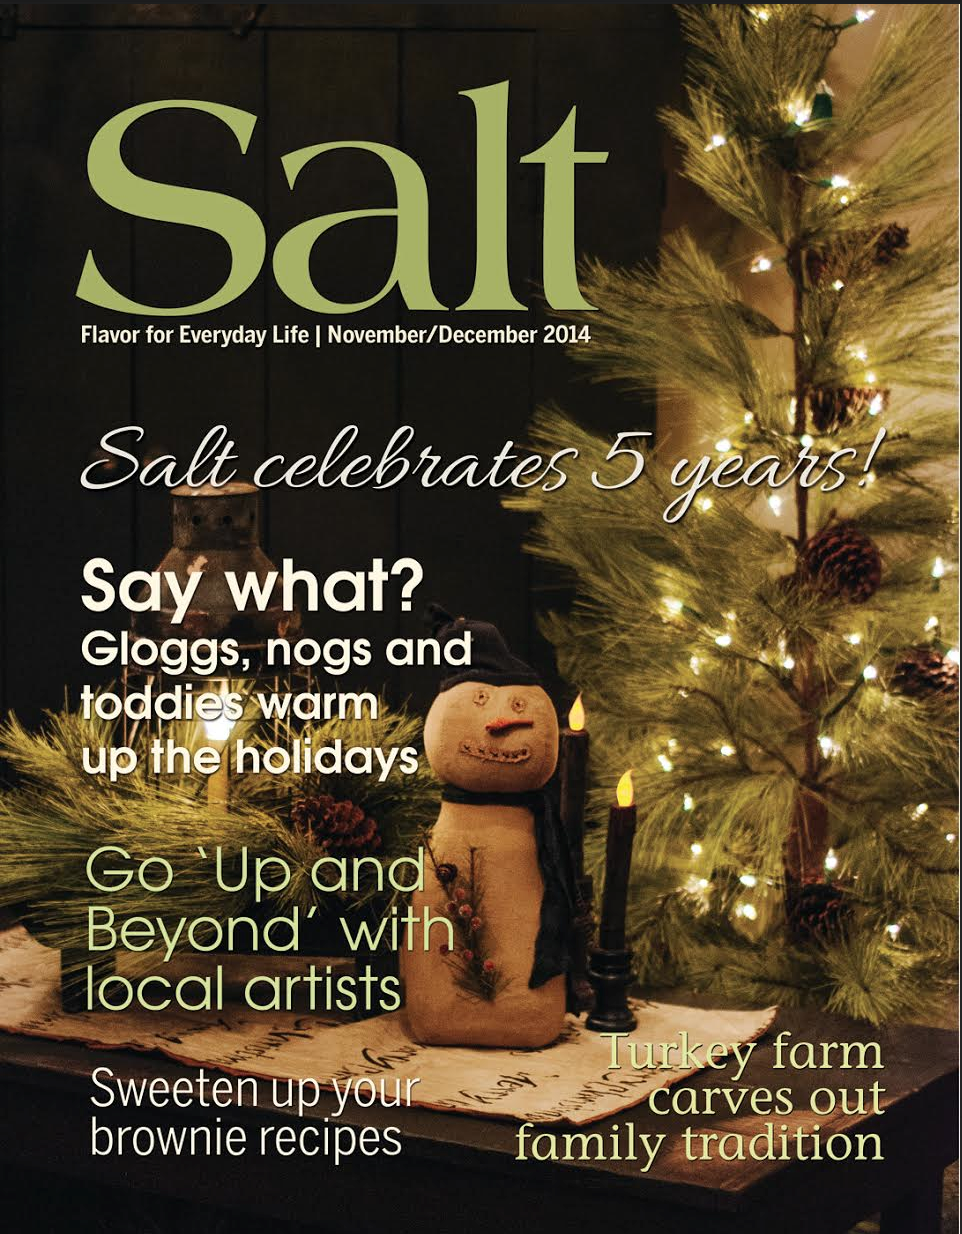 http://issuu.com/thesaltmagazine/docs/salt1114-w/0